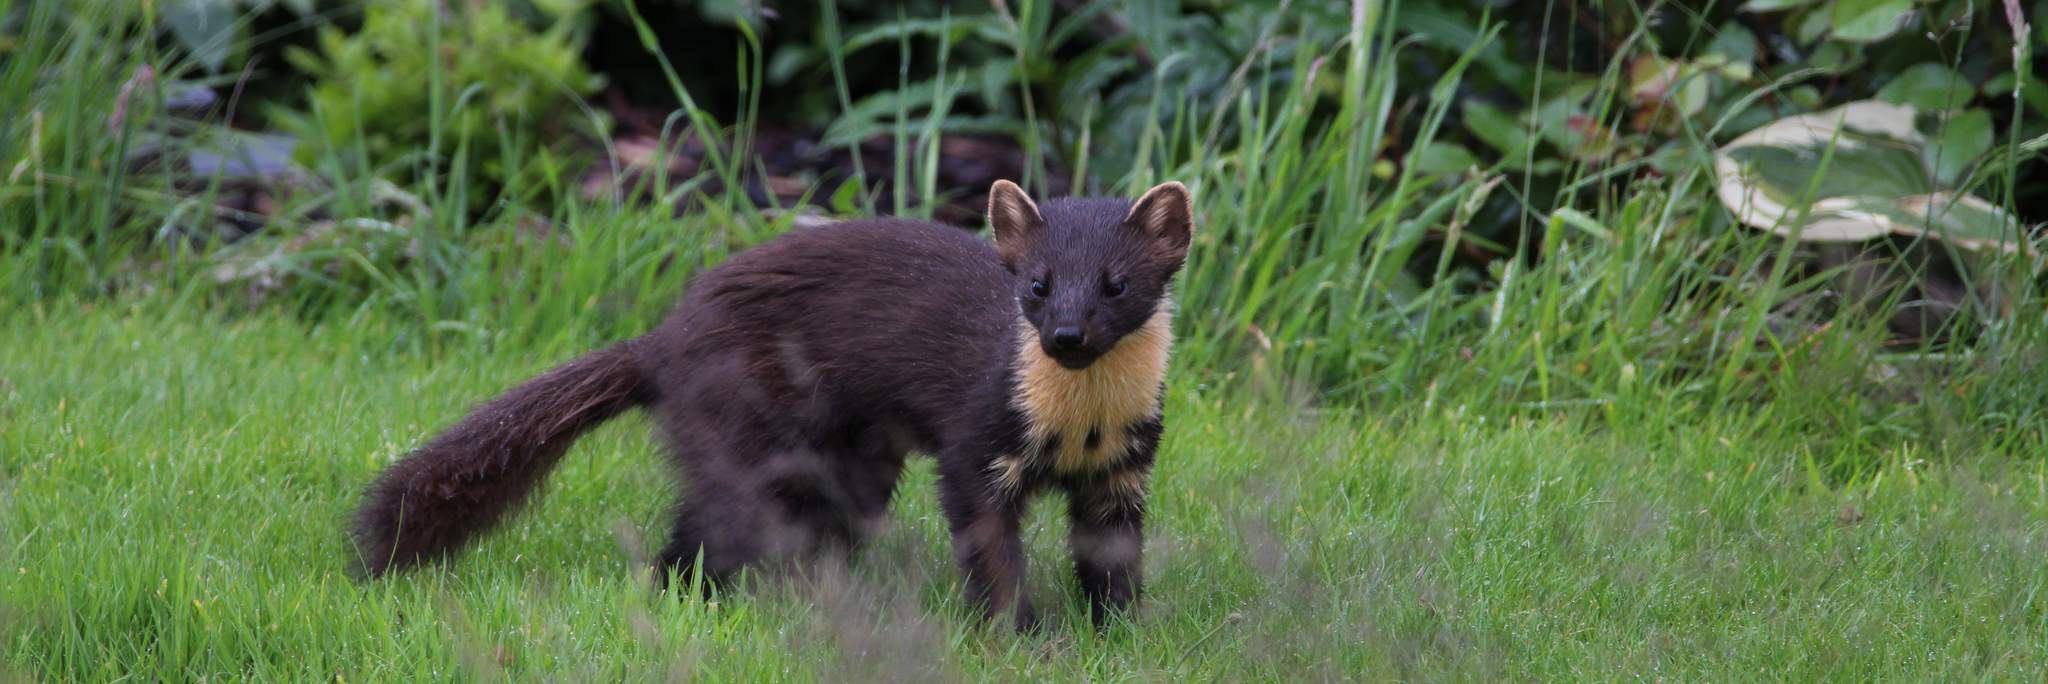 Wildlife in The Scottish Borders